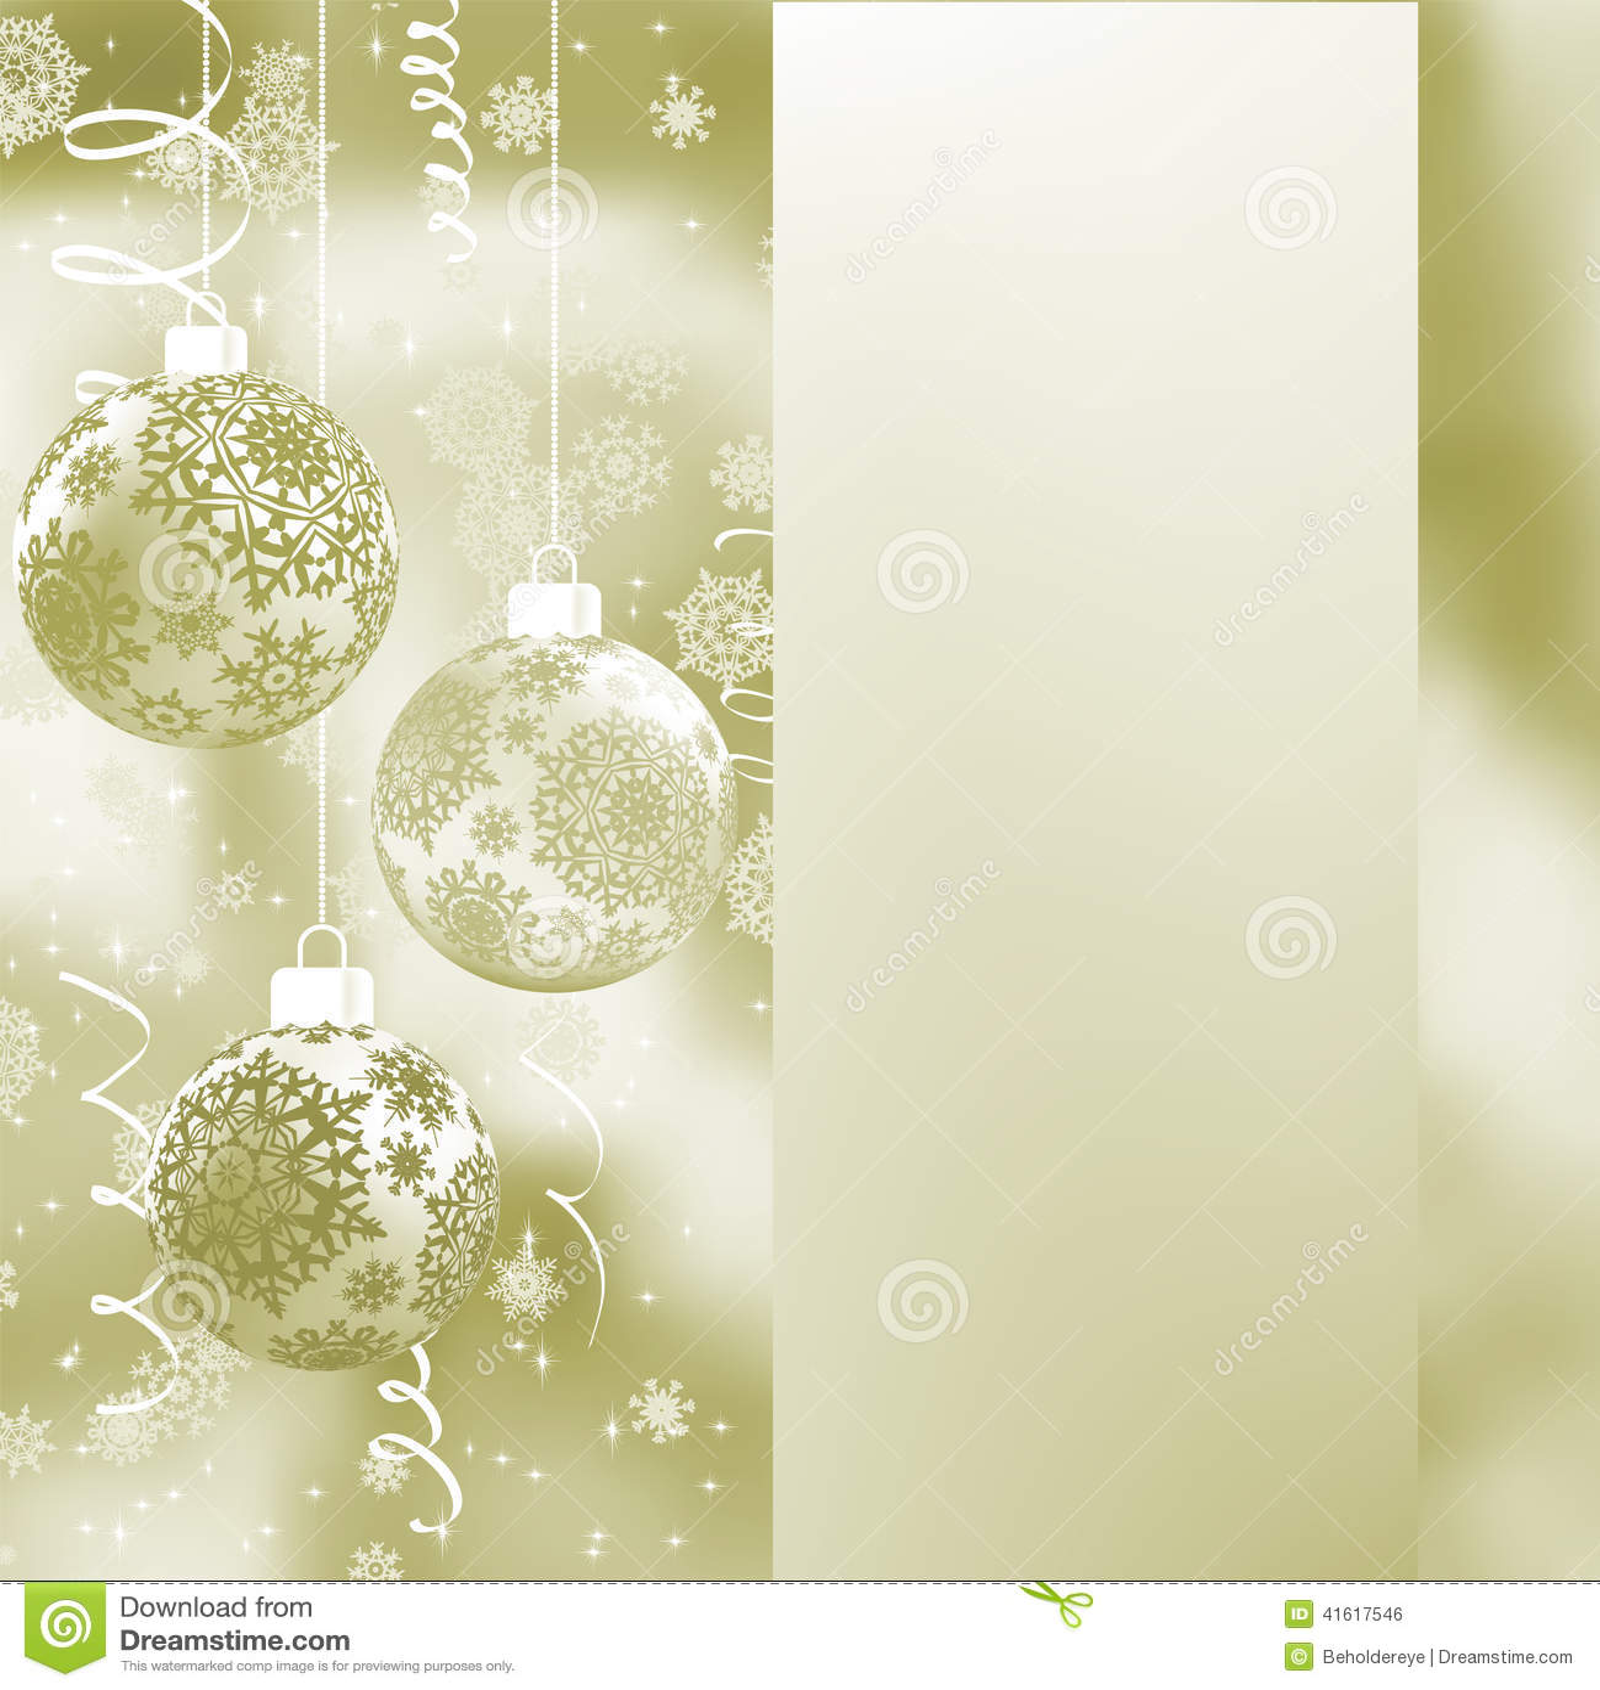 Elegant Christmas Background EPS 8 Stock Vector Image